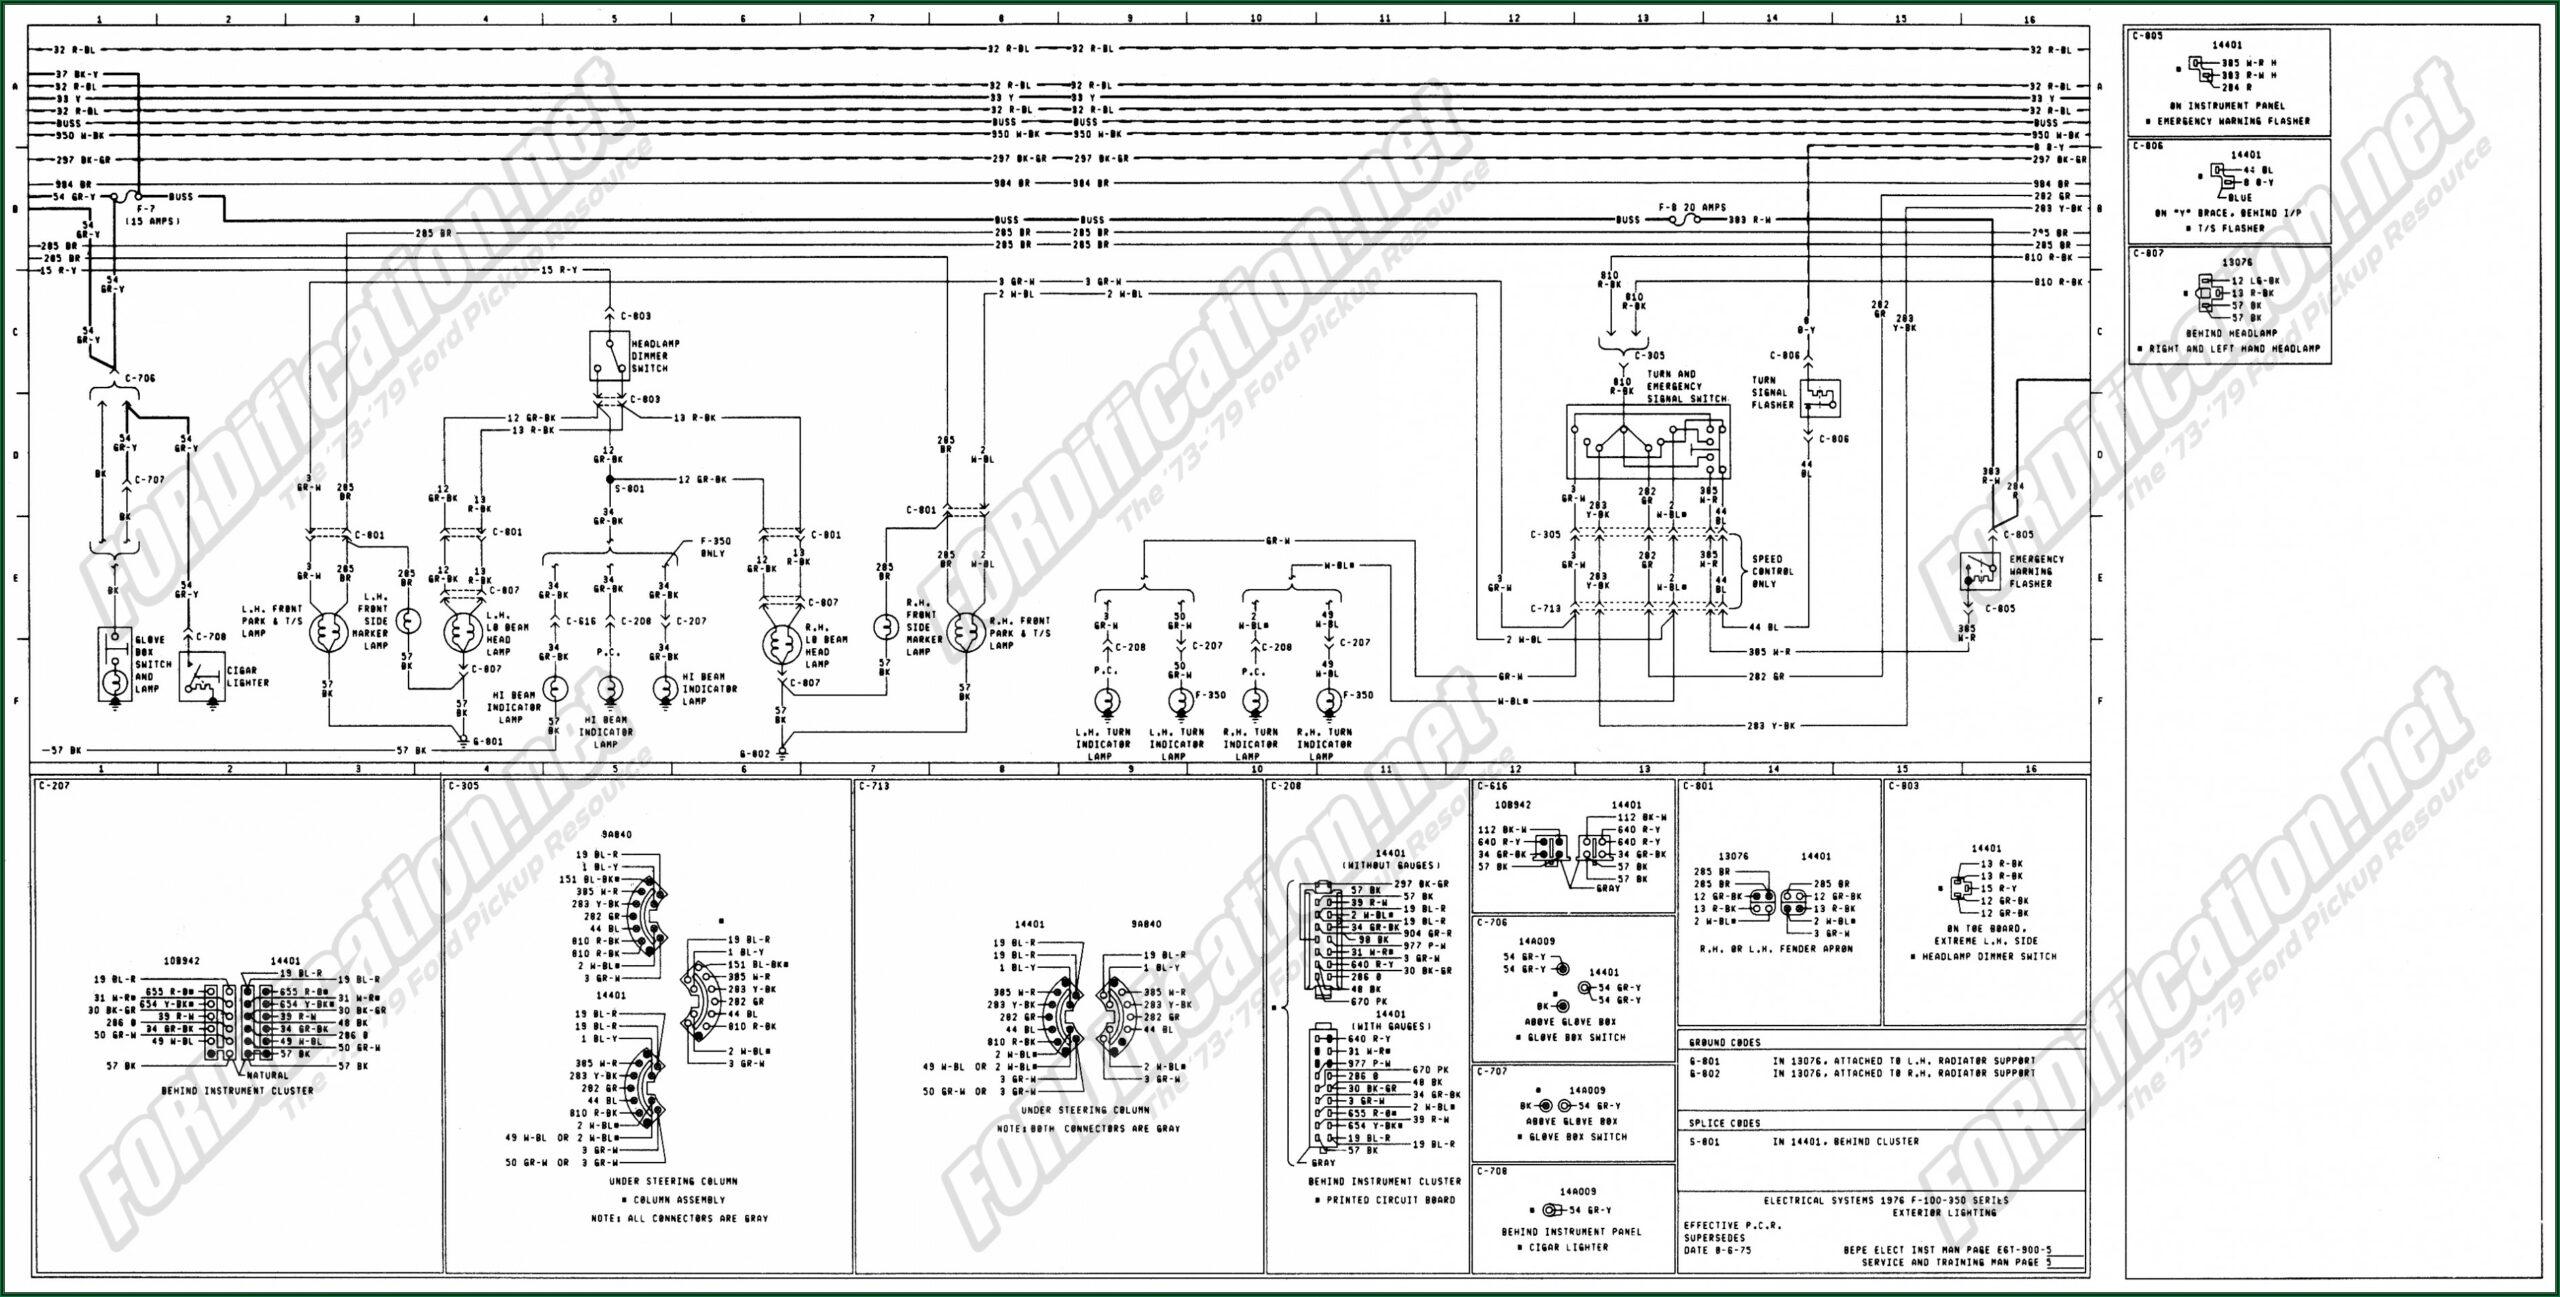 2001 Ford F150 Fuse Diagram Under Hood